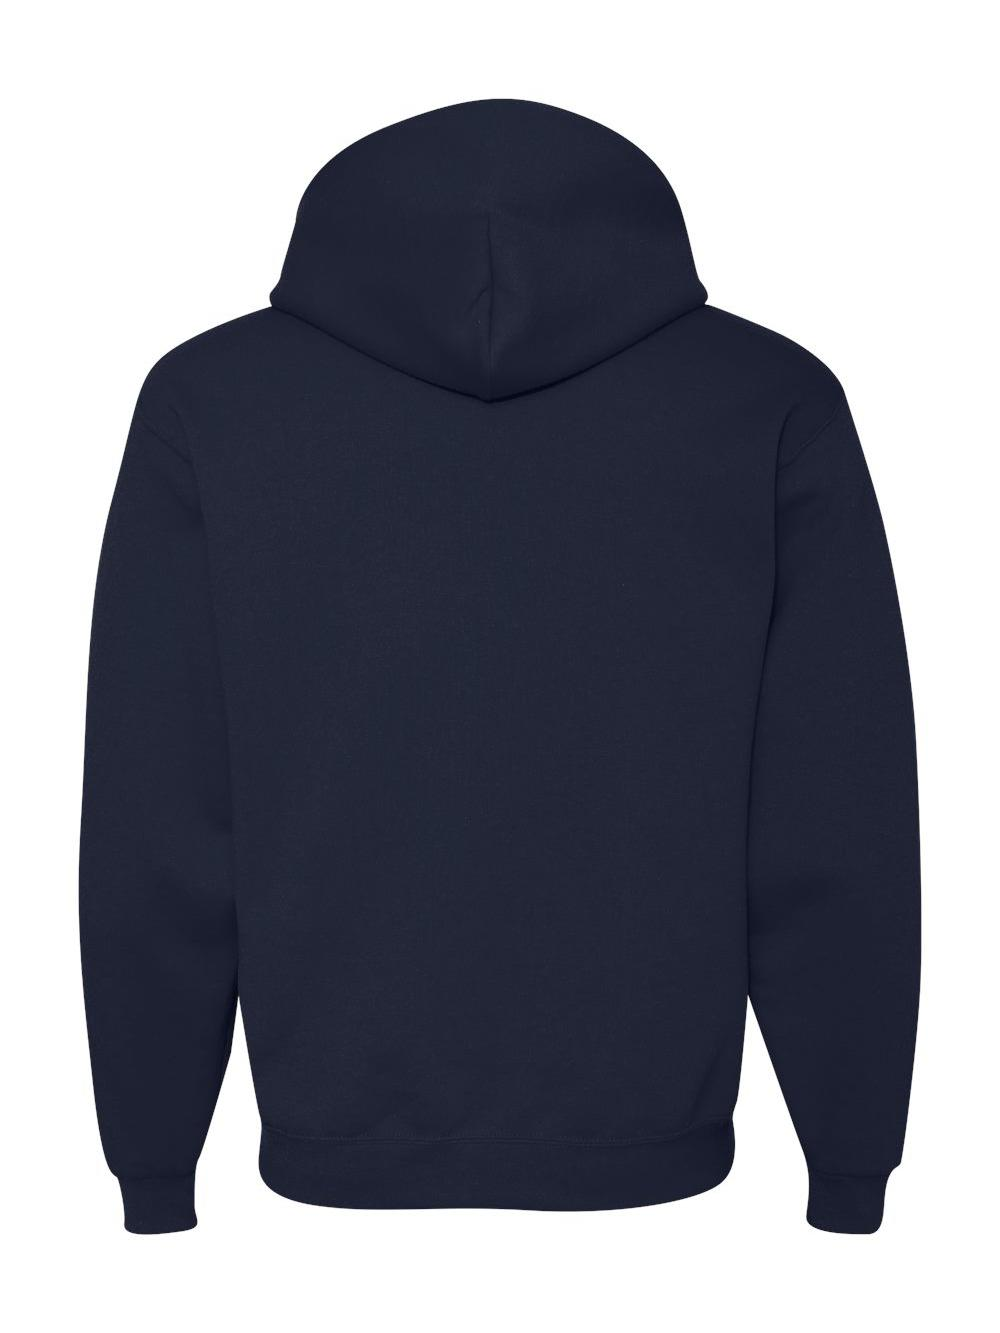 JERZEES Mens 50//50 Hooded Pullover Sweatshirt Tall Sizes XLT 2XLT 3XLT 996MT